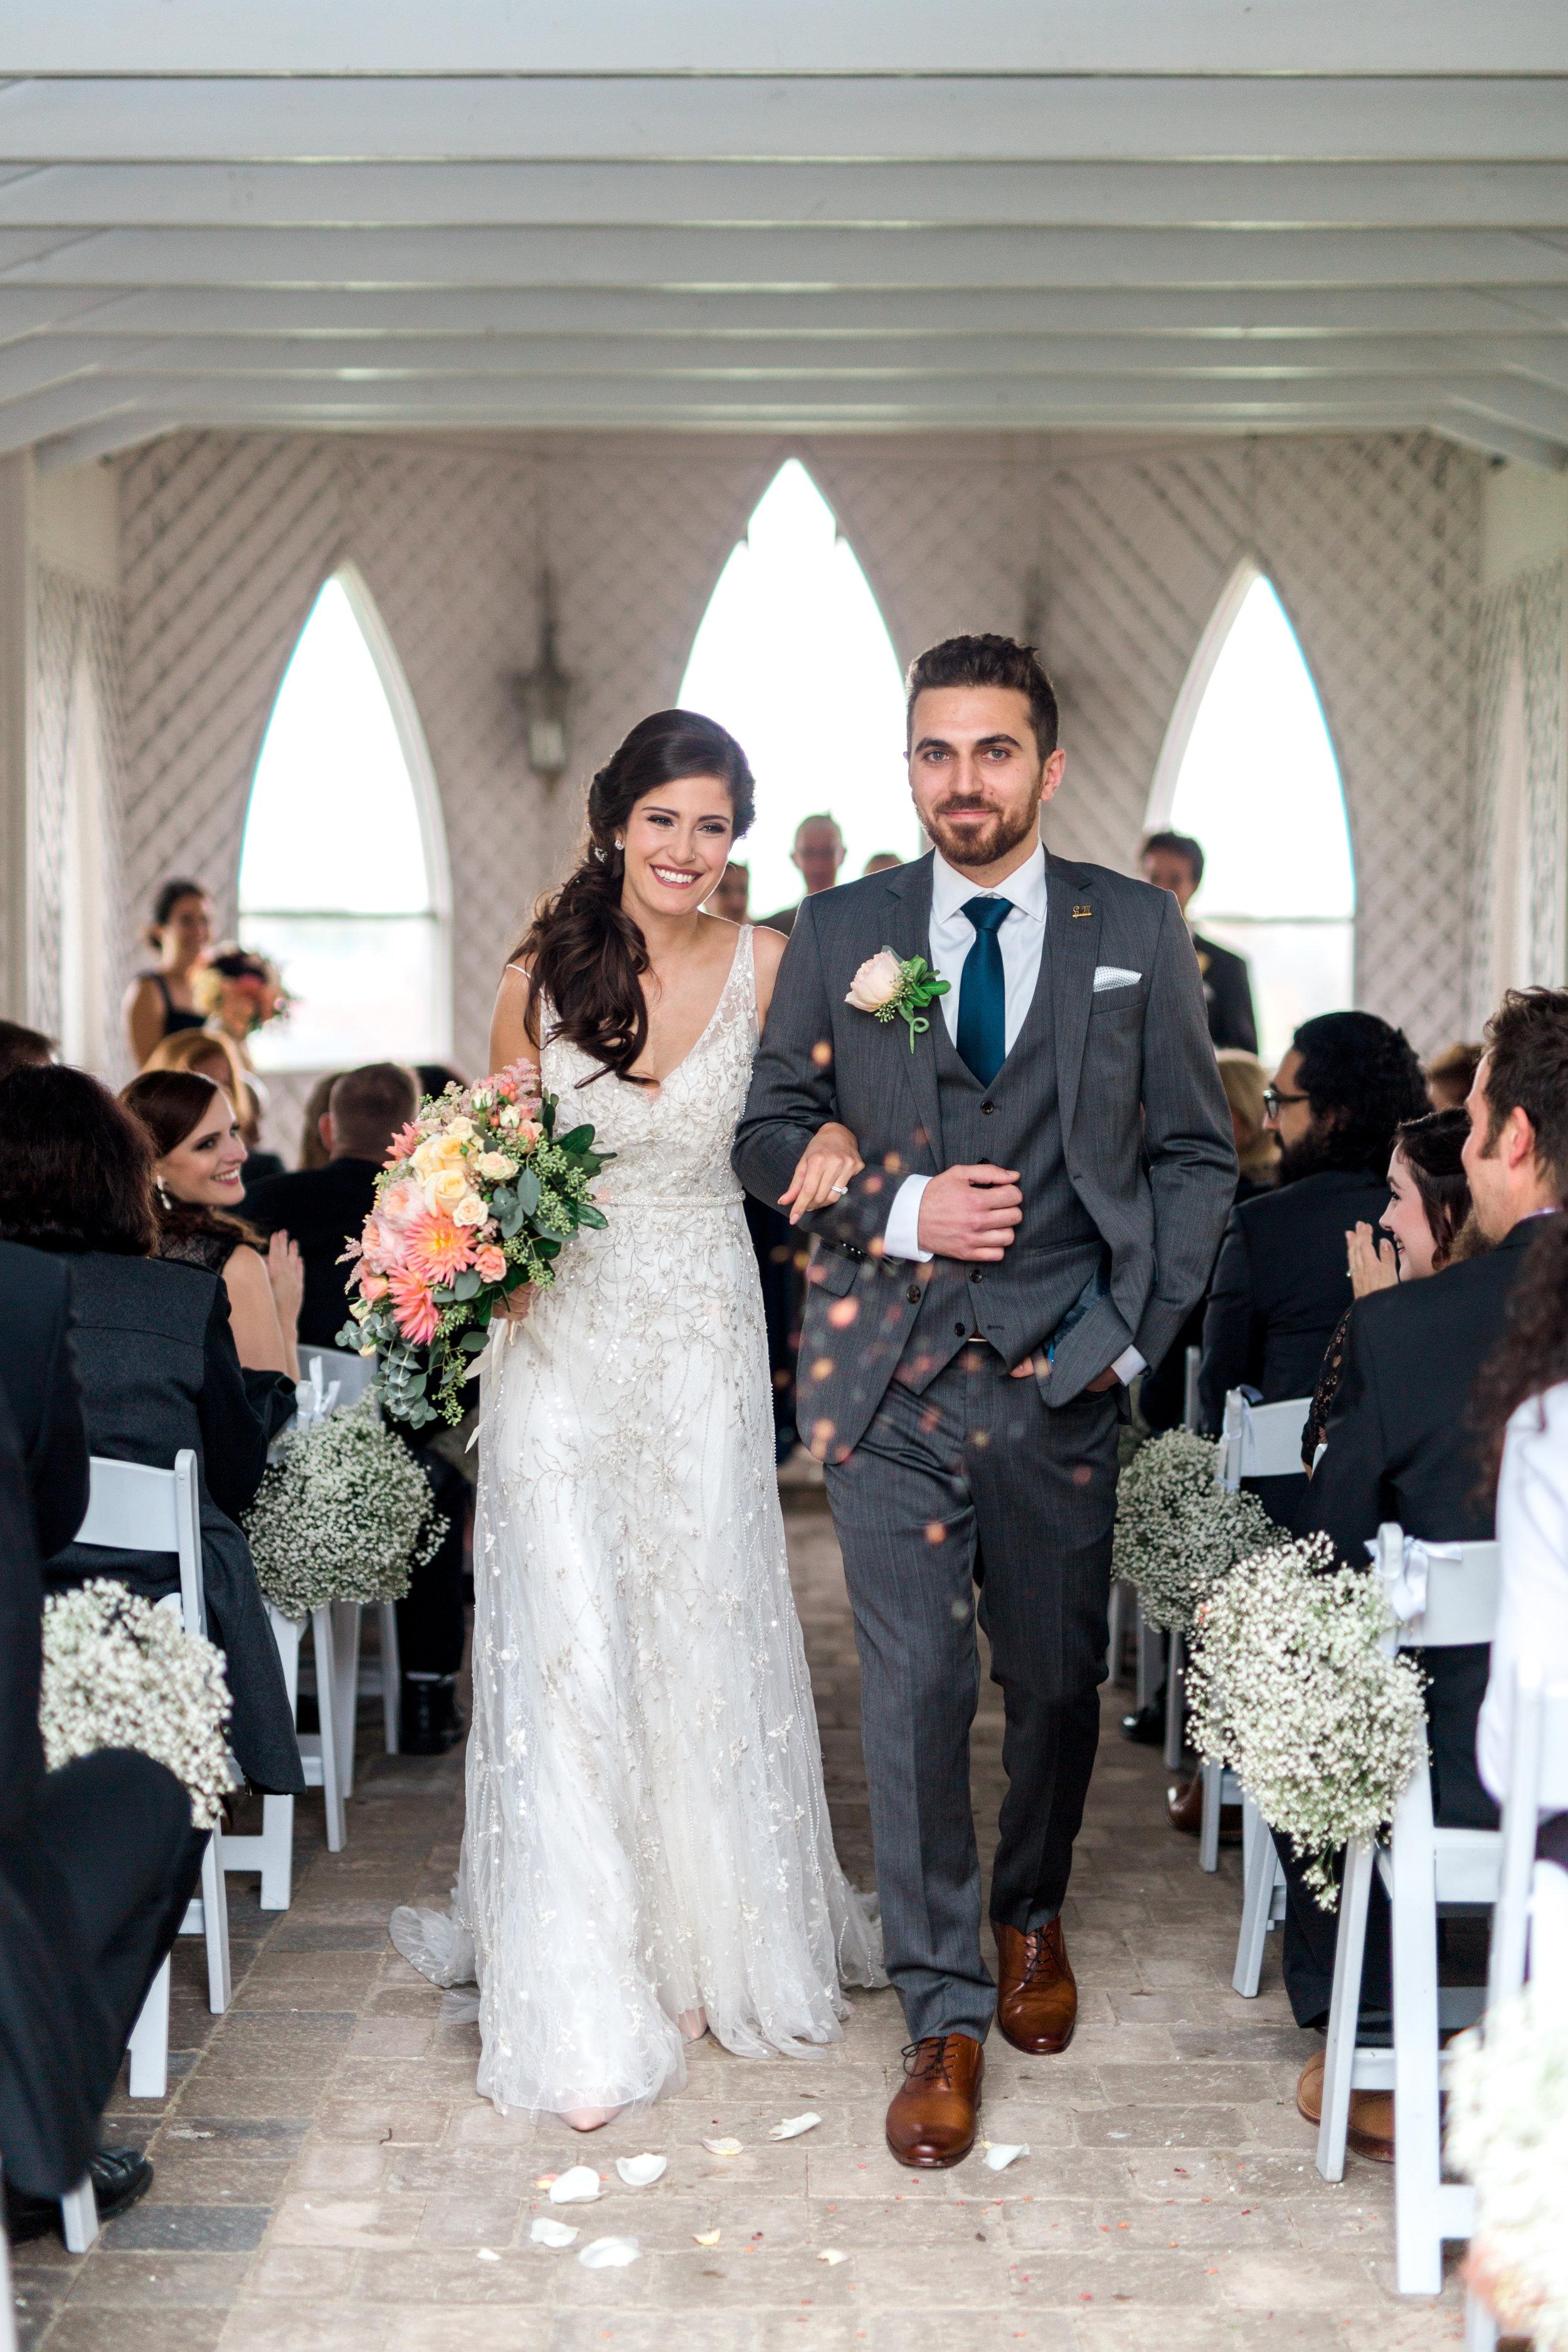 Amir-Golbazi-Danielle-Giroux-Photography_Toronto-Wedding_Cedarwood_Rachel-Paul_238.jpg